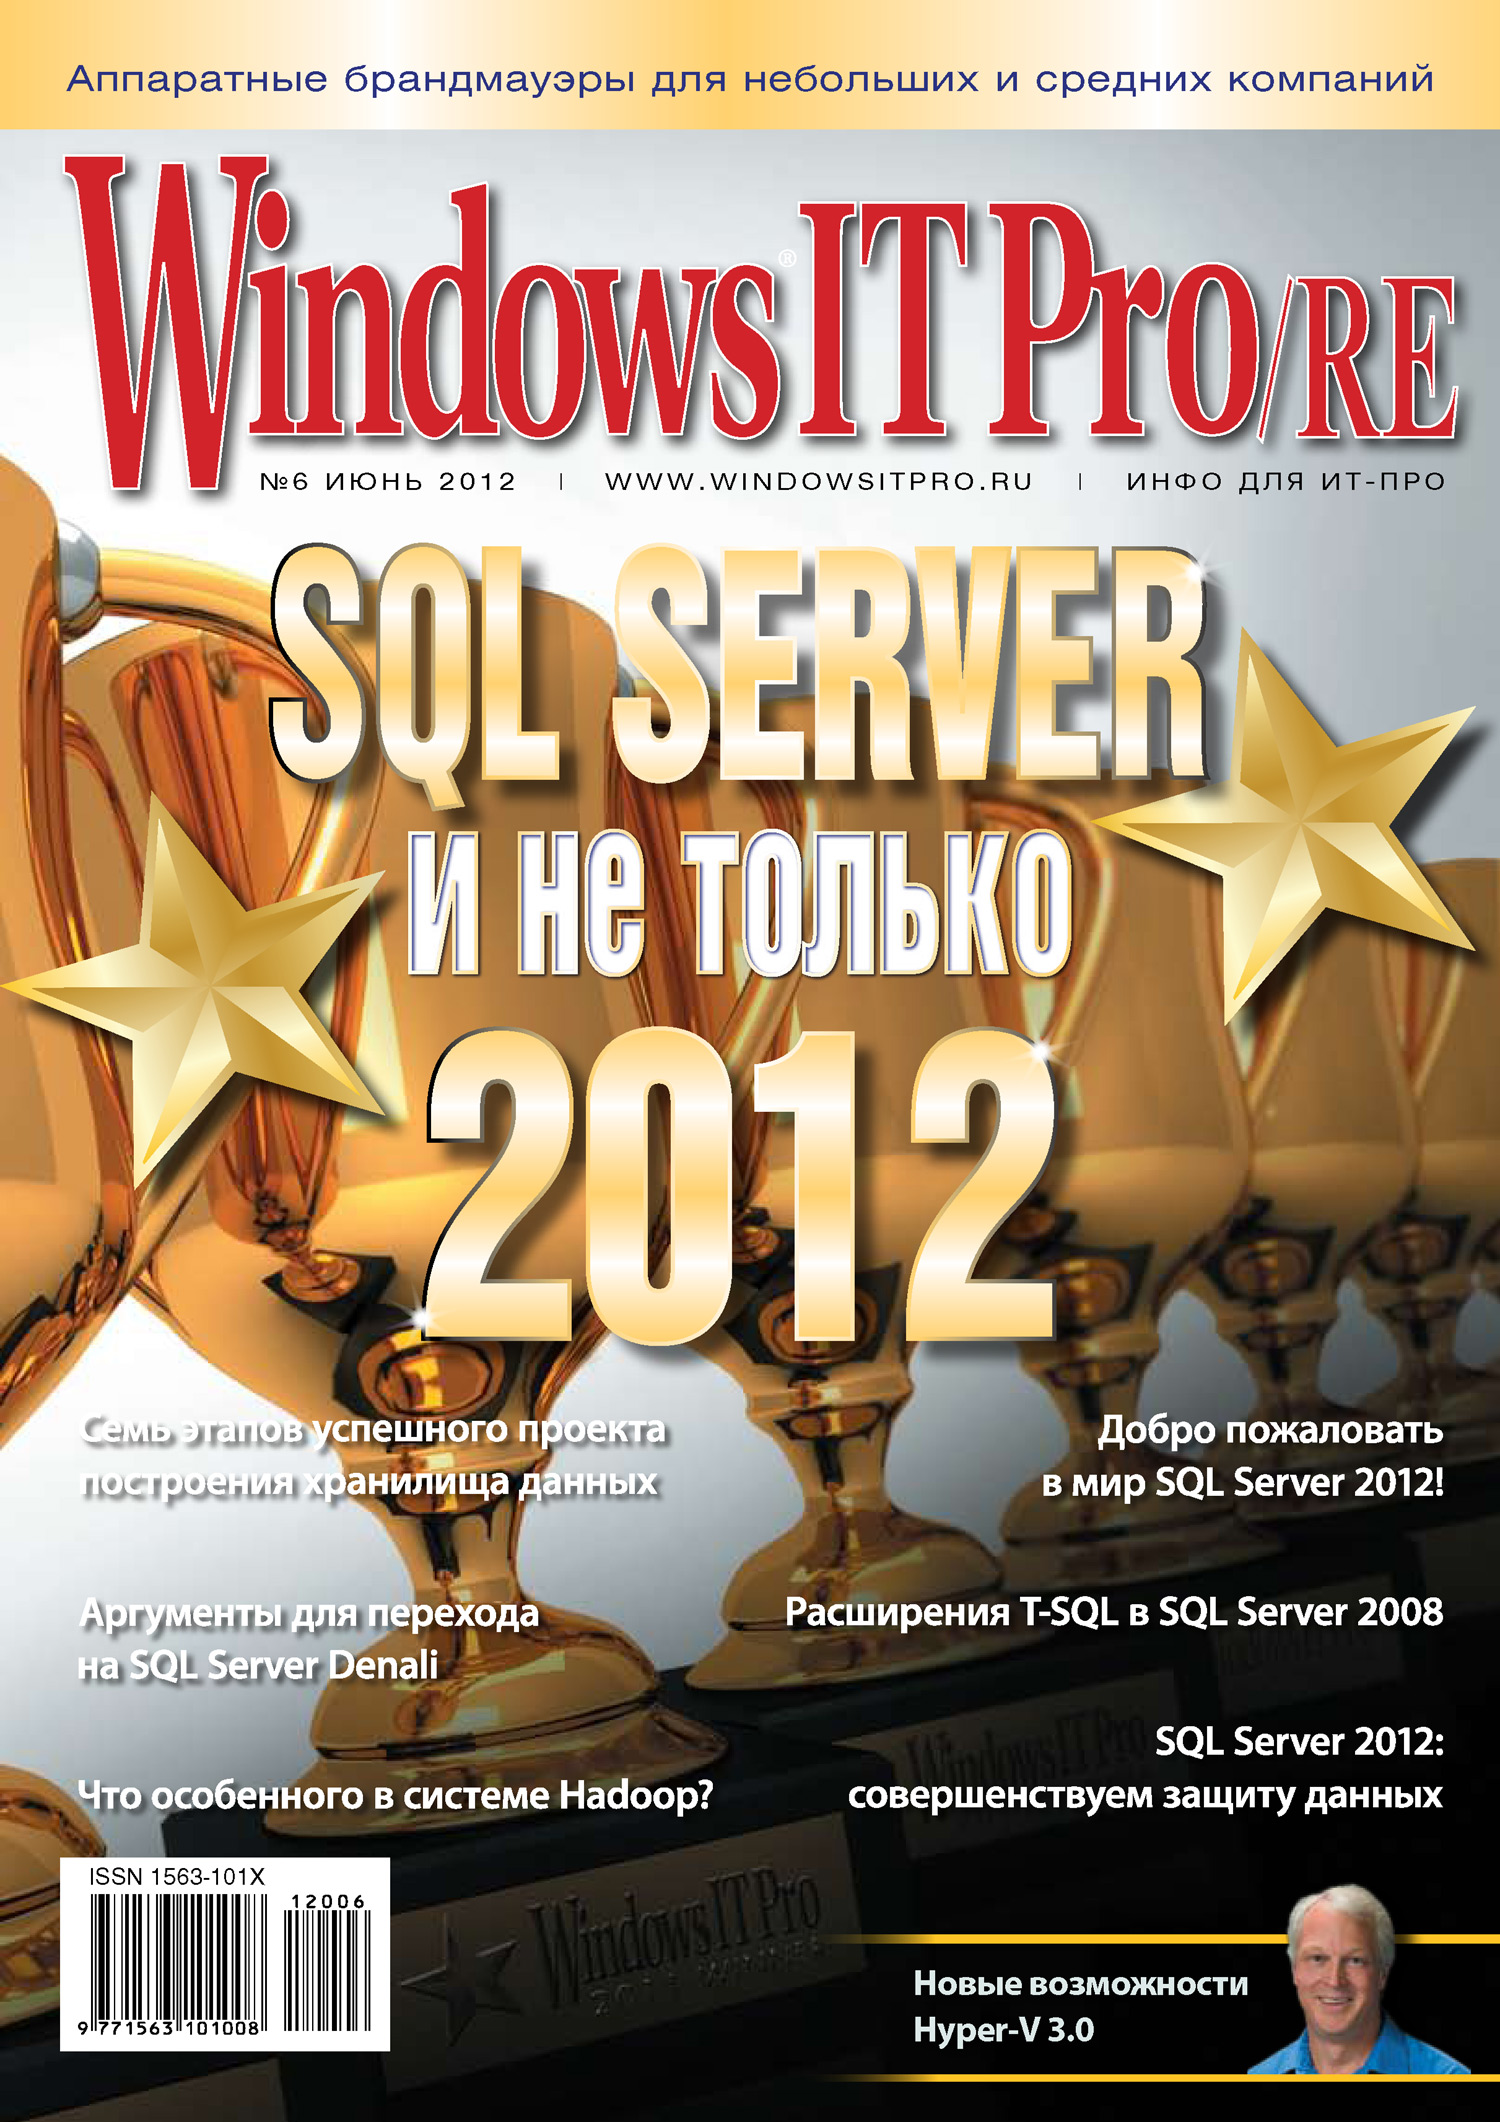 Открытые системы Windows IT Pro/RE №06/2012 ицик бен ган microsoft sql server 2012 основы t sql